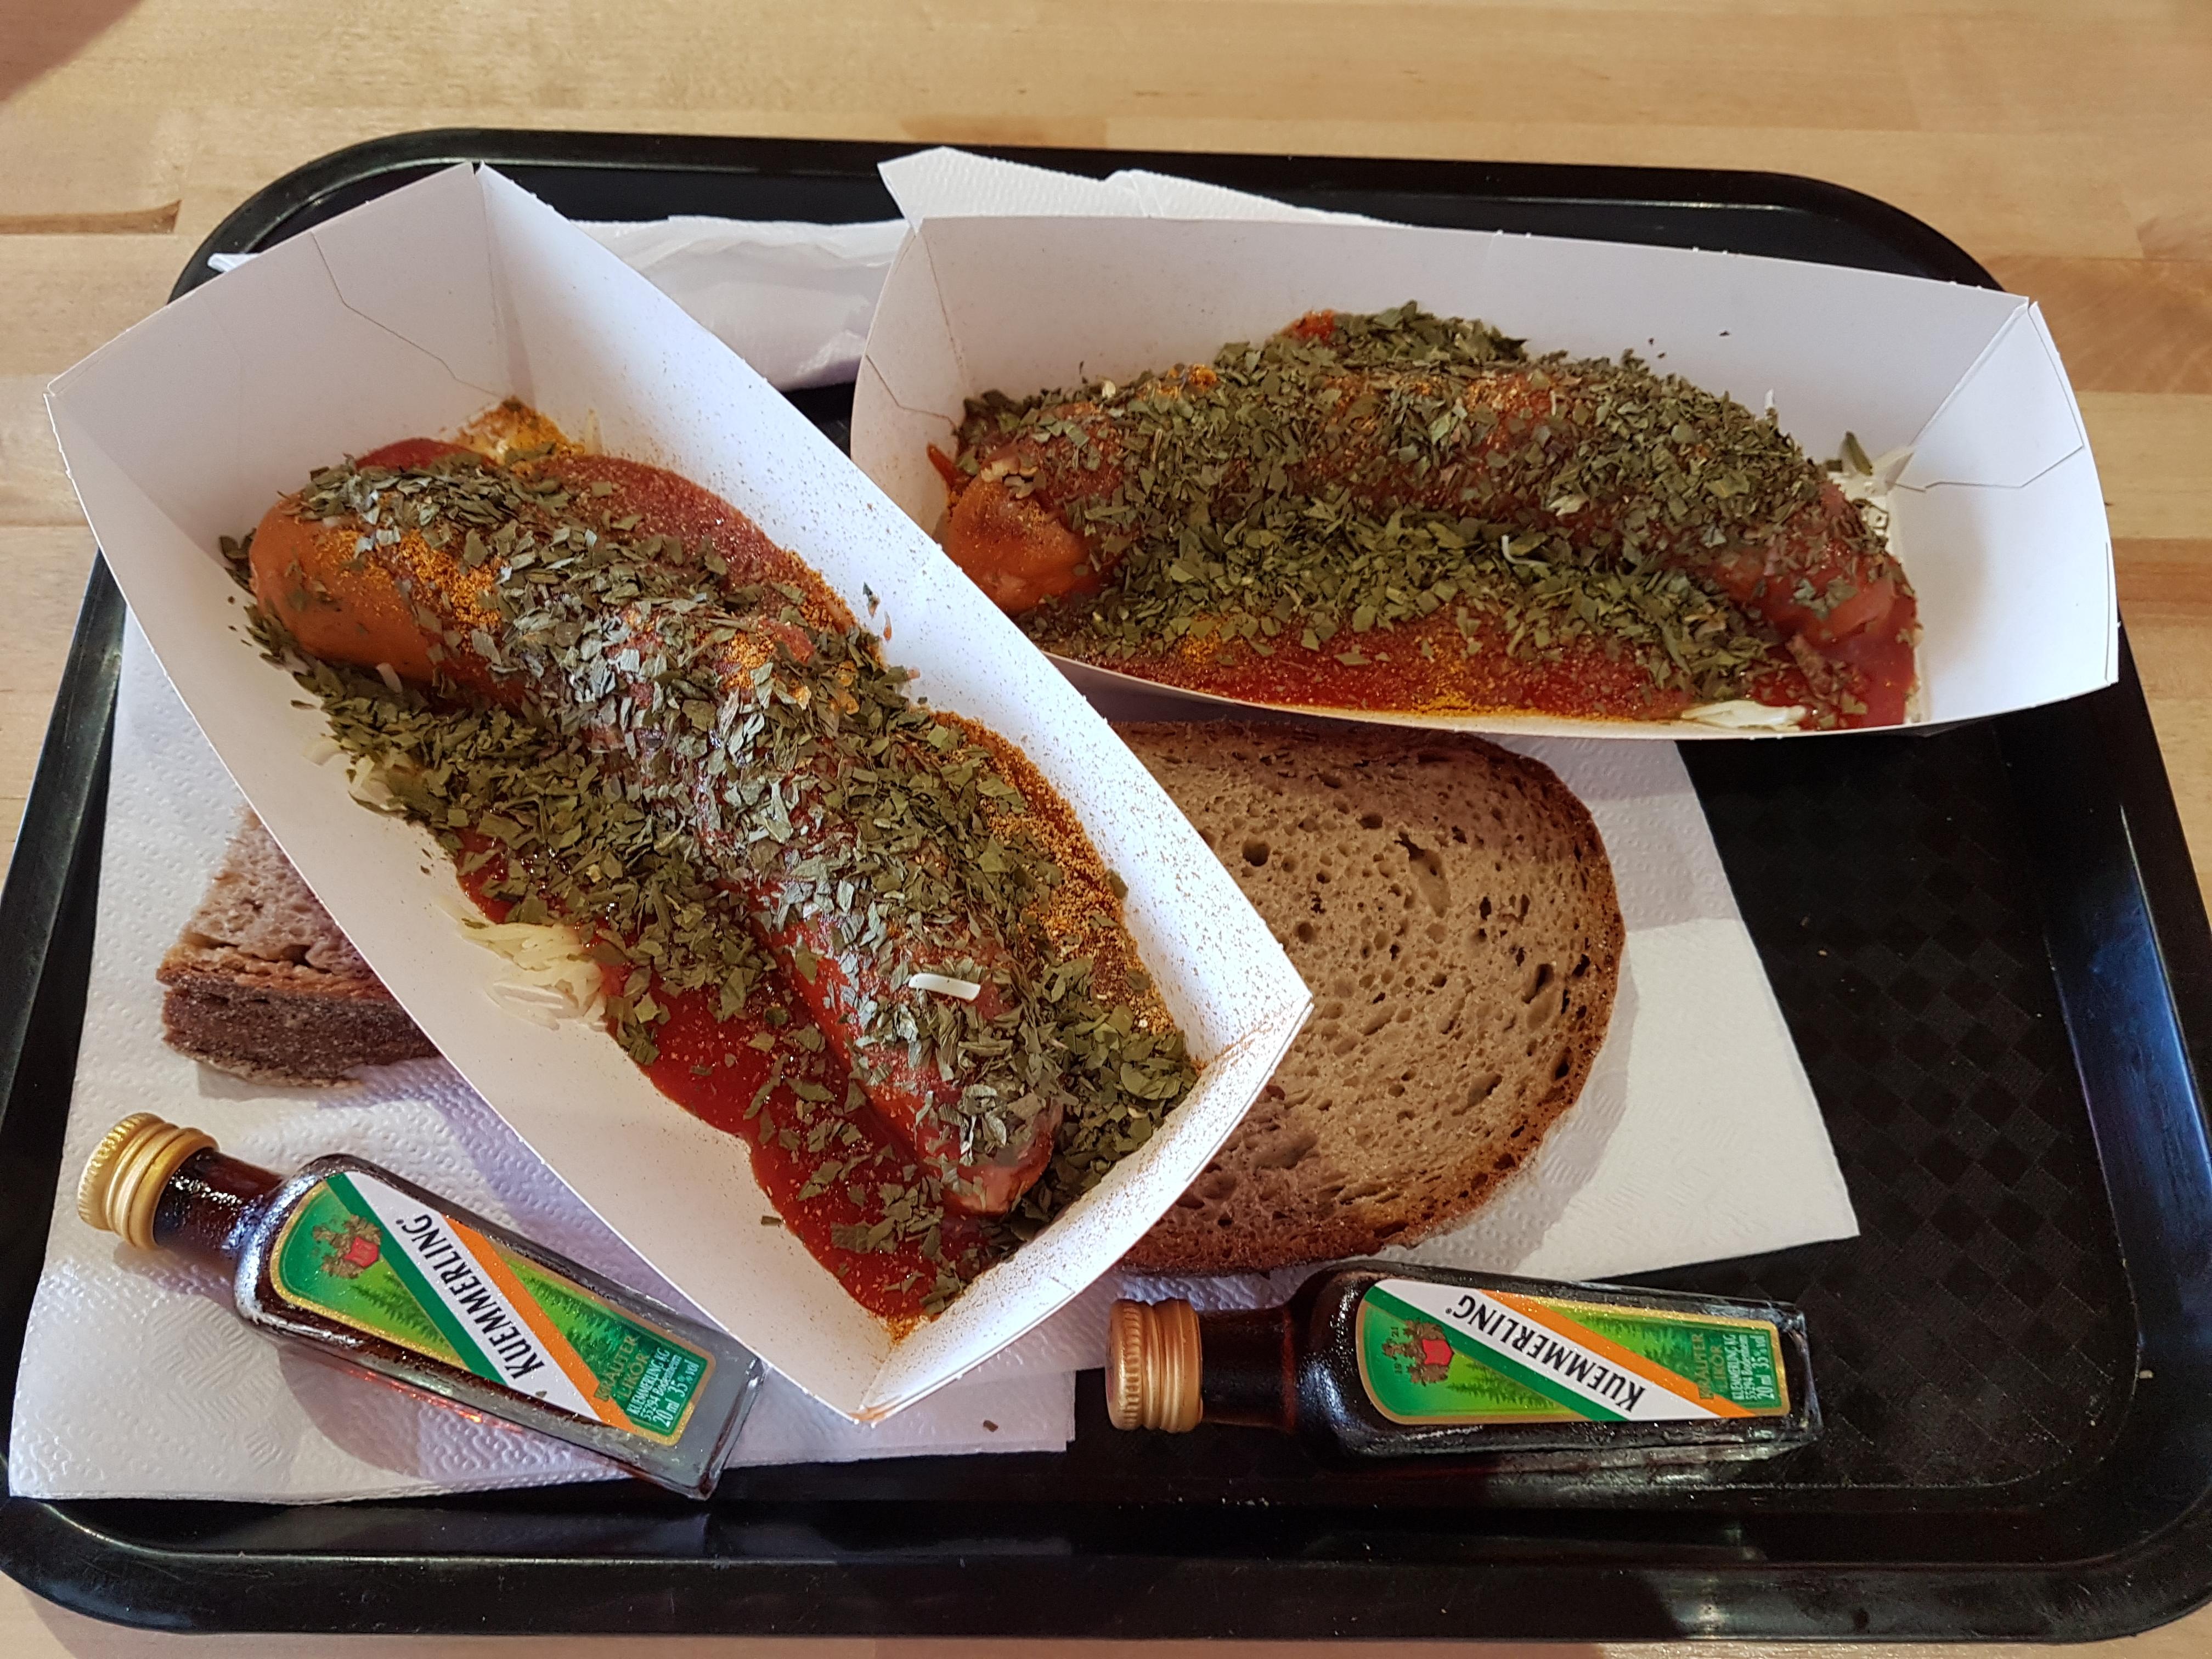 http://foodloader.net/Holz_2017-07-12_DJ_Duese_Wurst.jpg